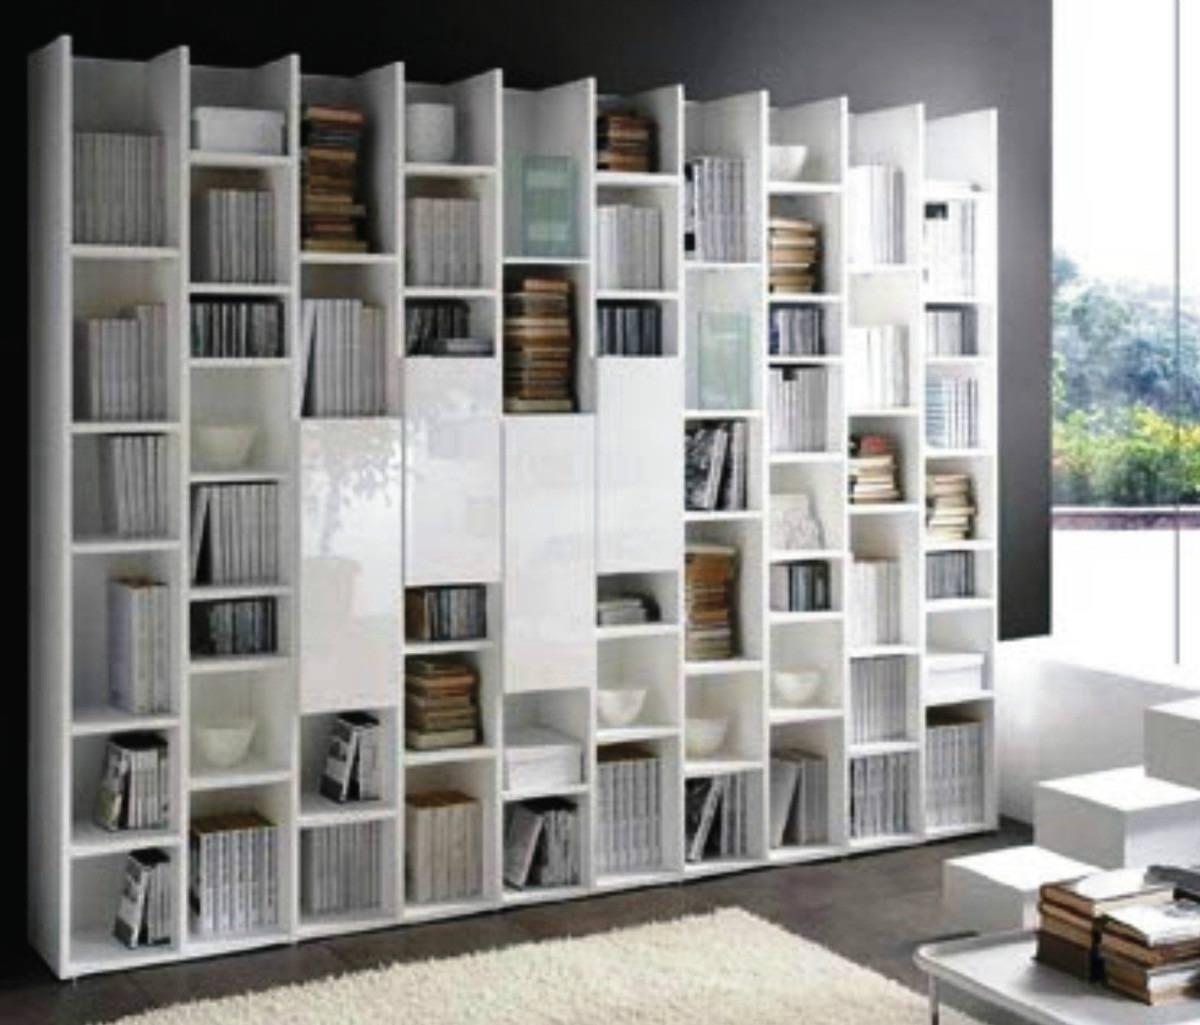 dise o bibliotecas fotos modelo blanco moderno